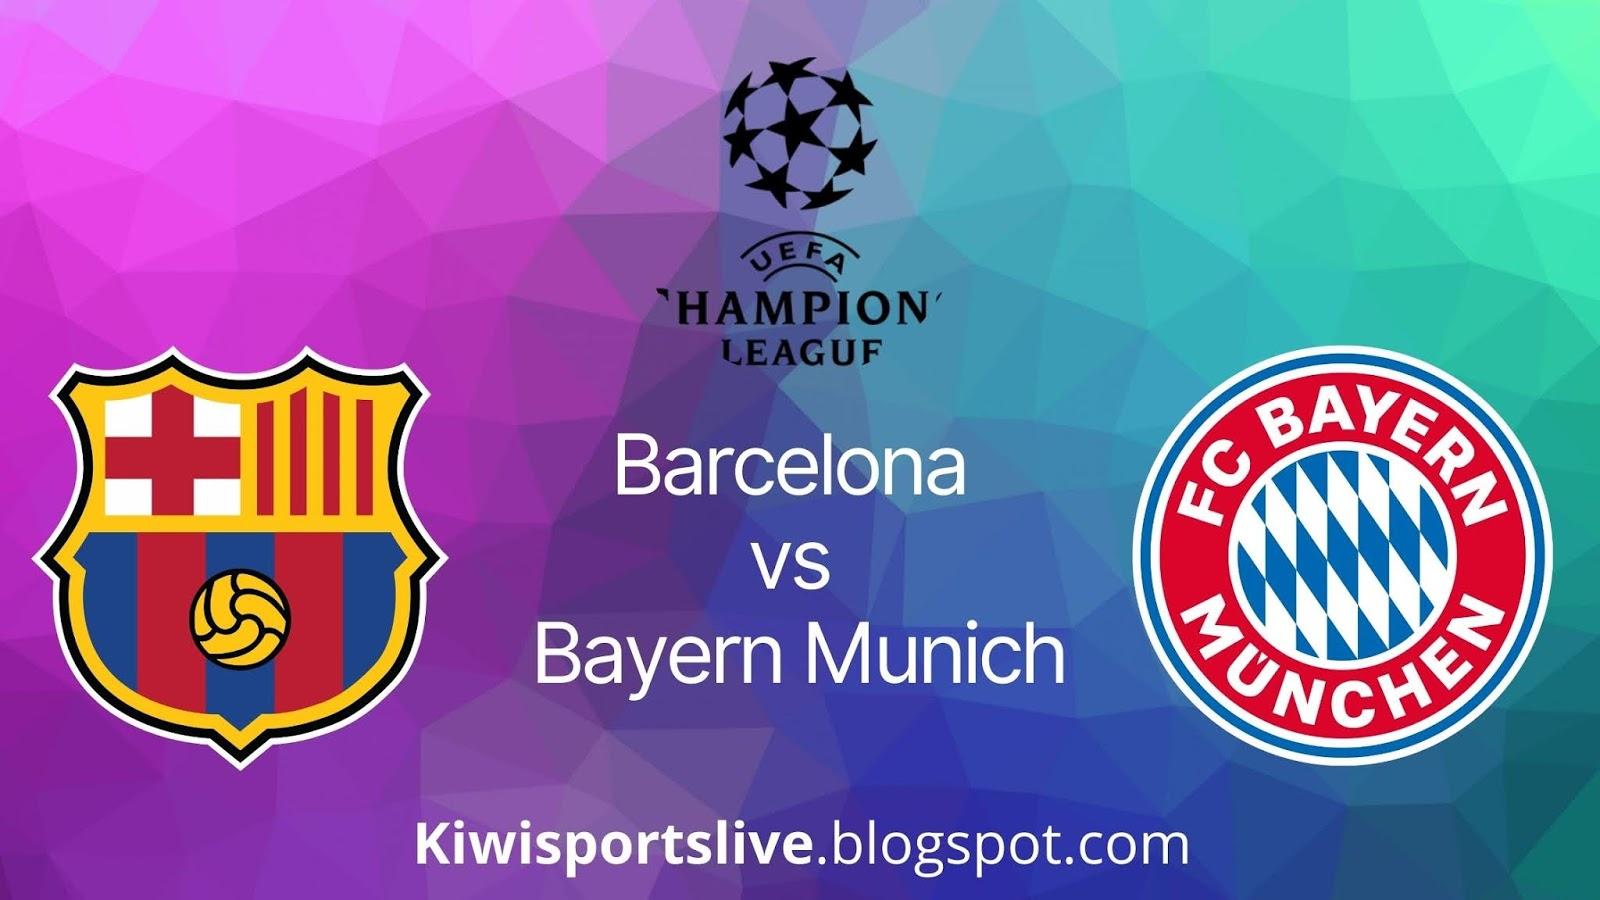 Barcelona vs Bayern Munich isl 2020 kerala blasters ipl 2020 epicsports alternative kiwisports.live